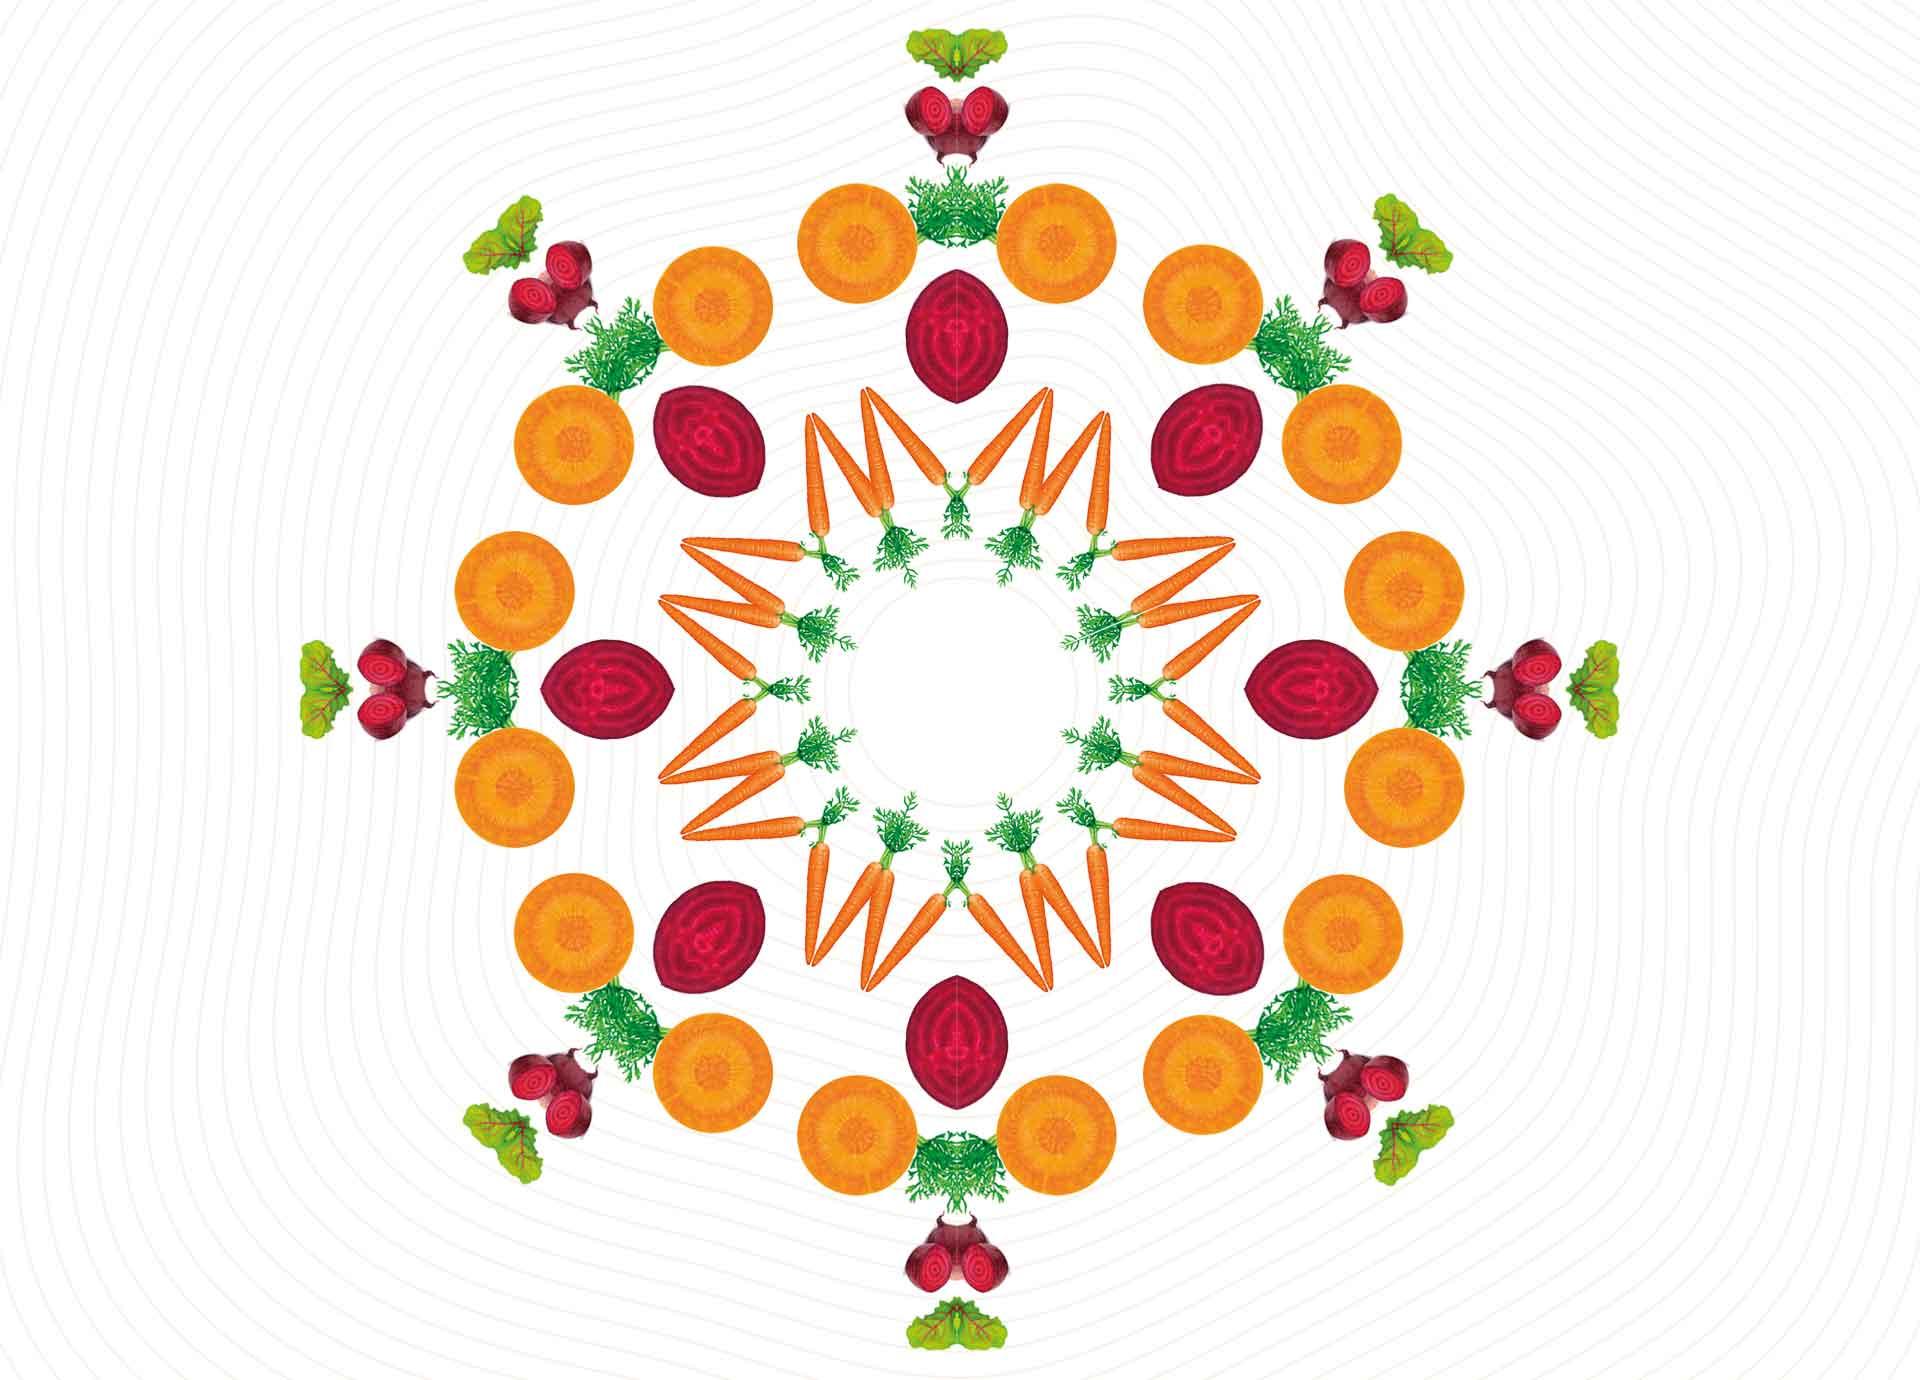 2_gero-apetito_PAKUOTES_kaleidoskopas_1920X1380-maz